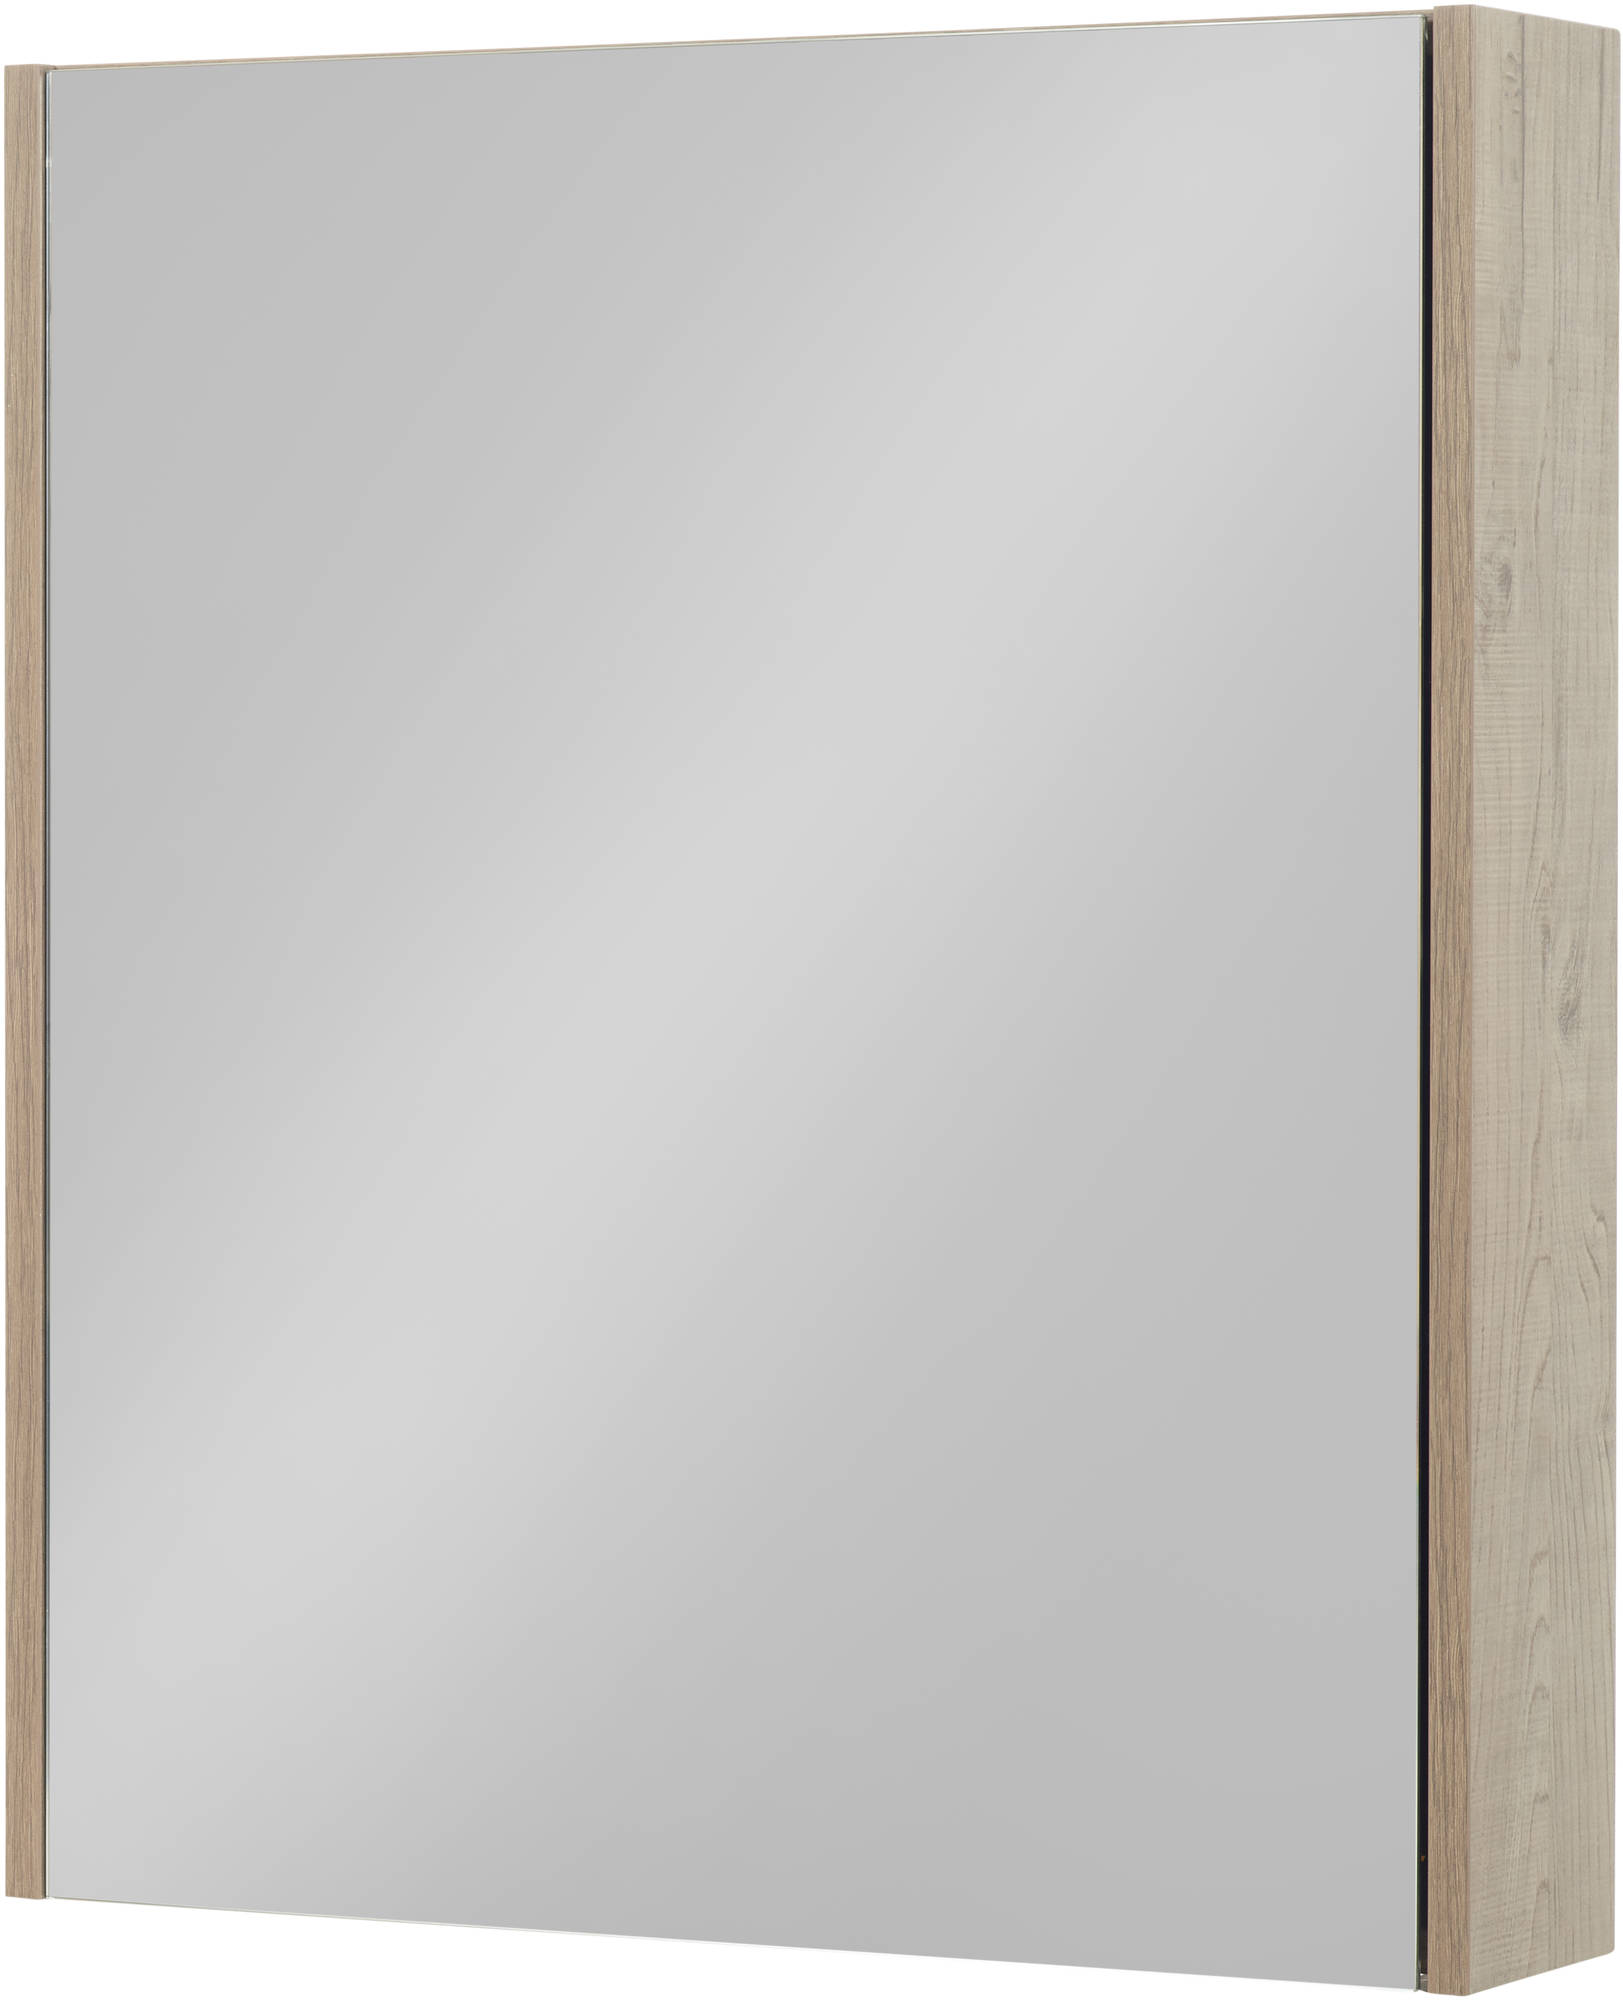 Saniselect Socan Spiegelkast 60x14x70 cm Toffee